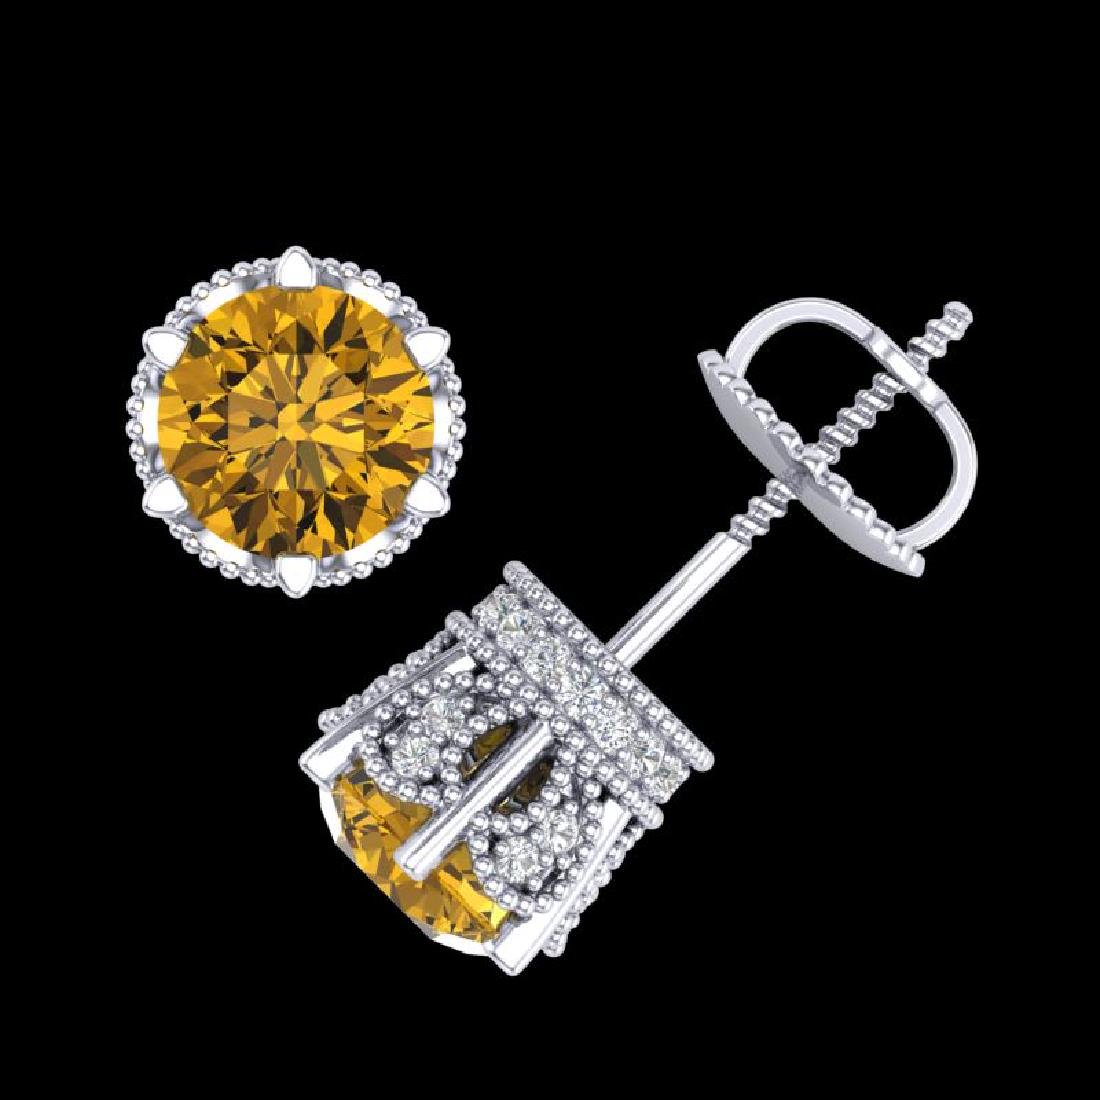 2.04 CTW Intense Fancy Yellow Diamond Art Deco Stud - 3